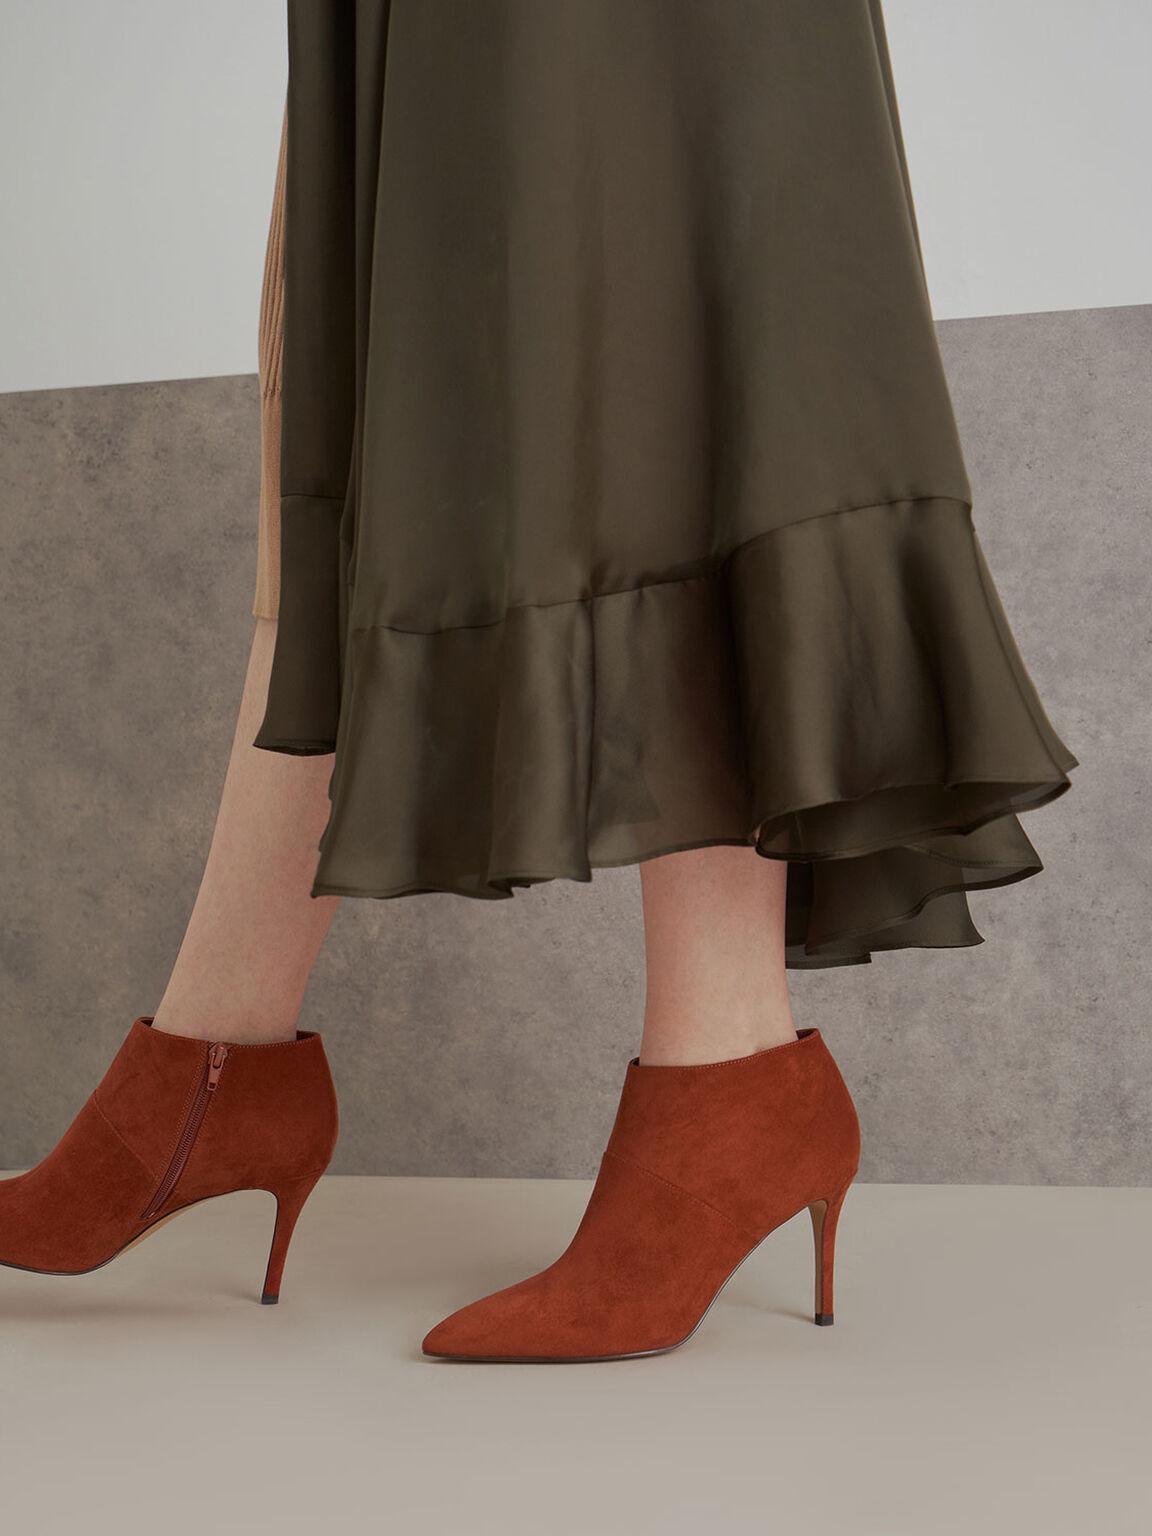 Stiletto Ankle Boots, Brick, hi-res